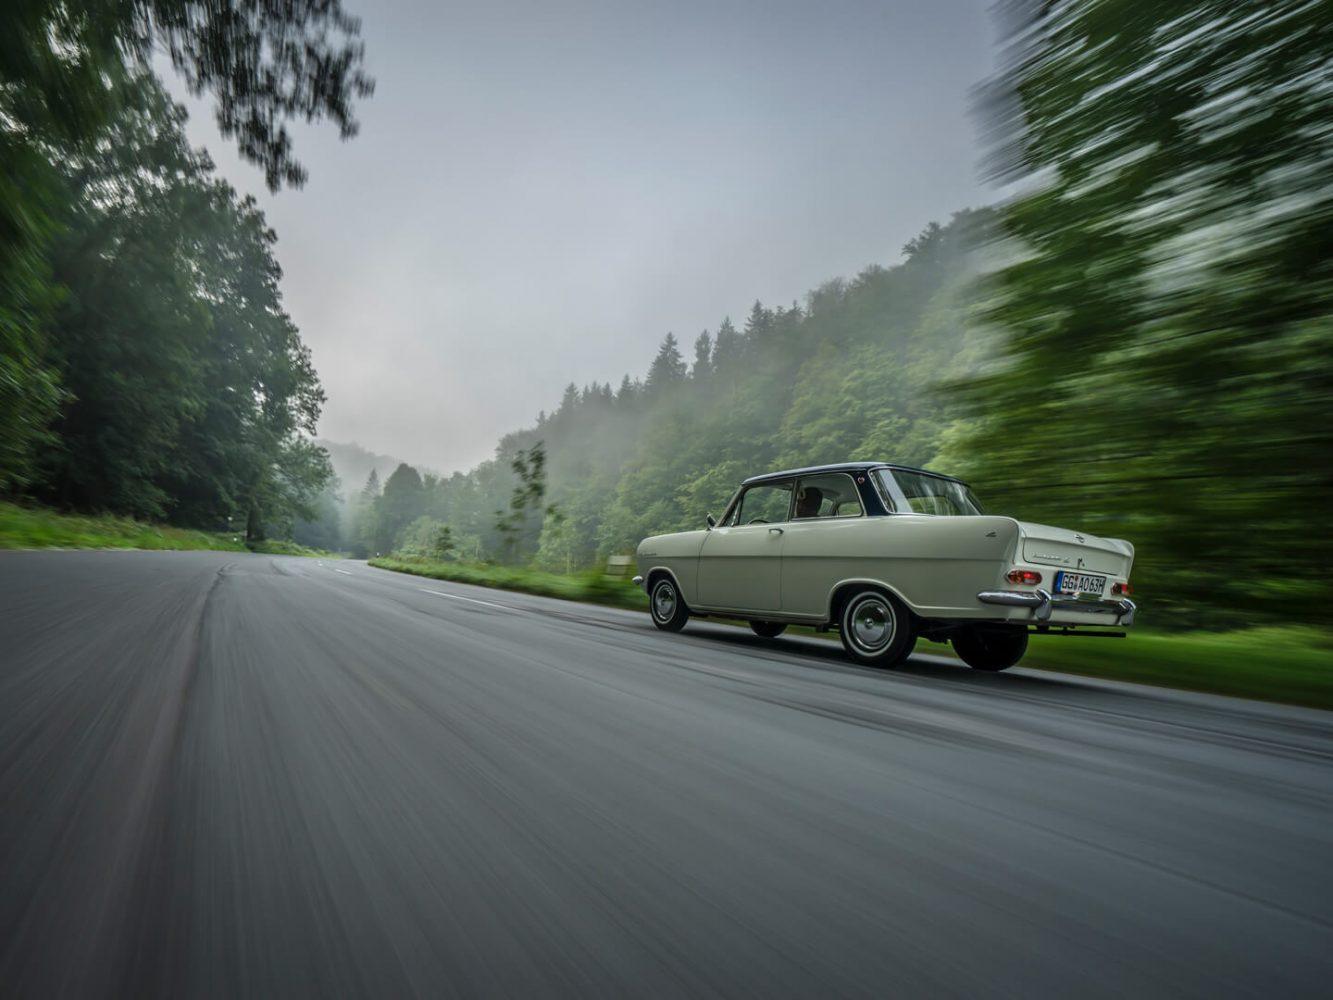 Motorliebe — LOST TRACKS > Buch, Großdeutschlandring, Opel